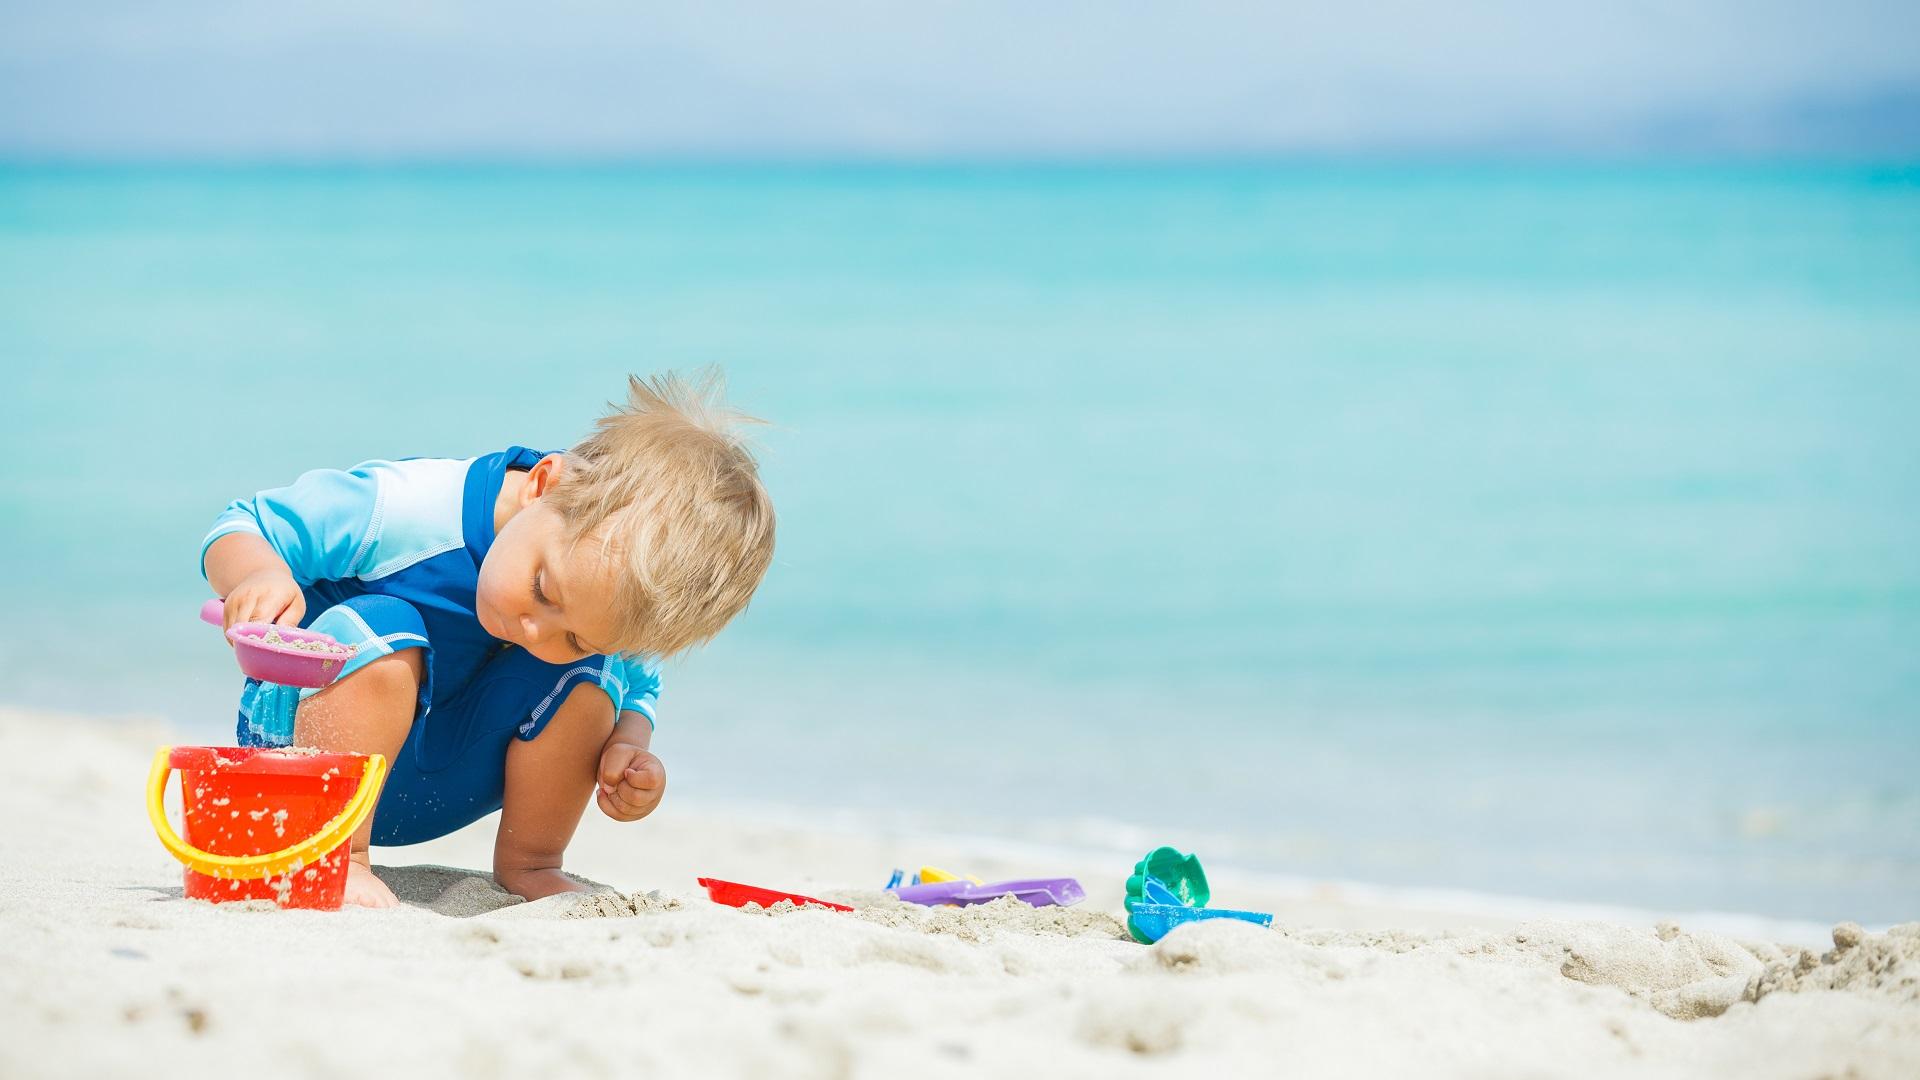 jongetje speelt op het strand